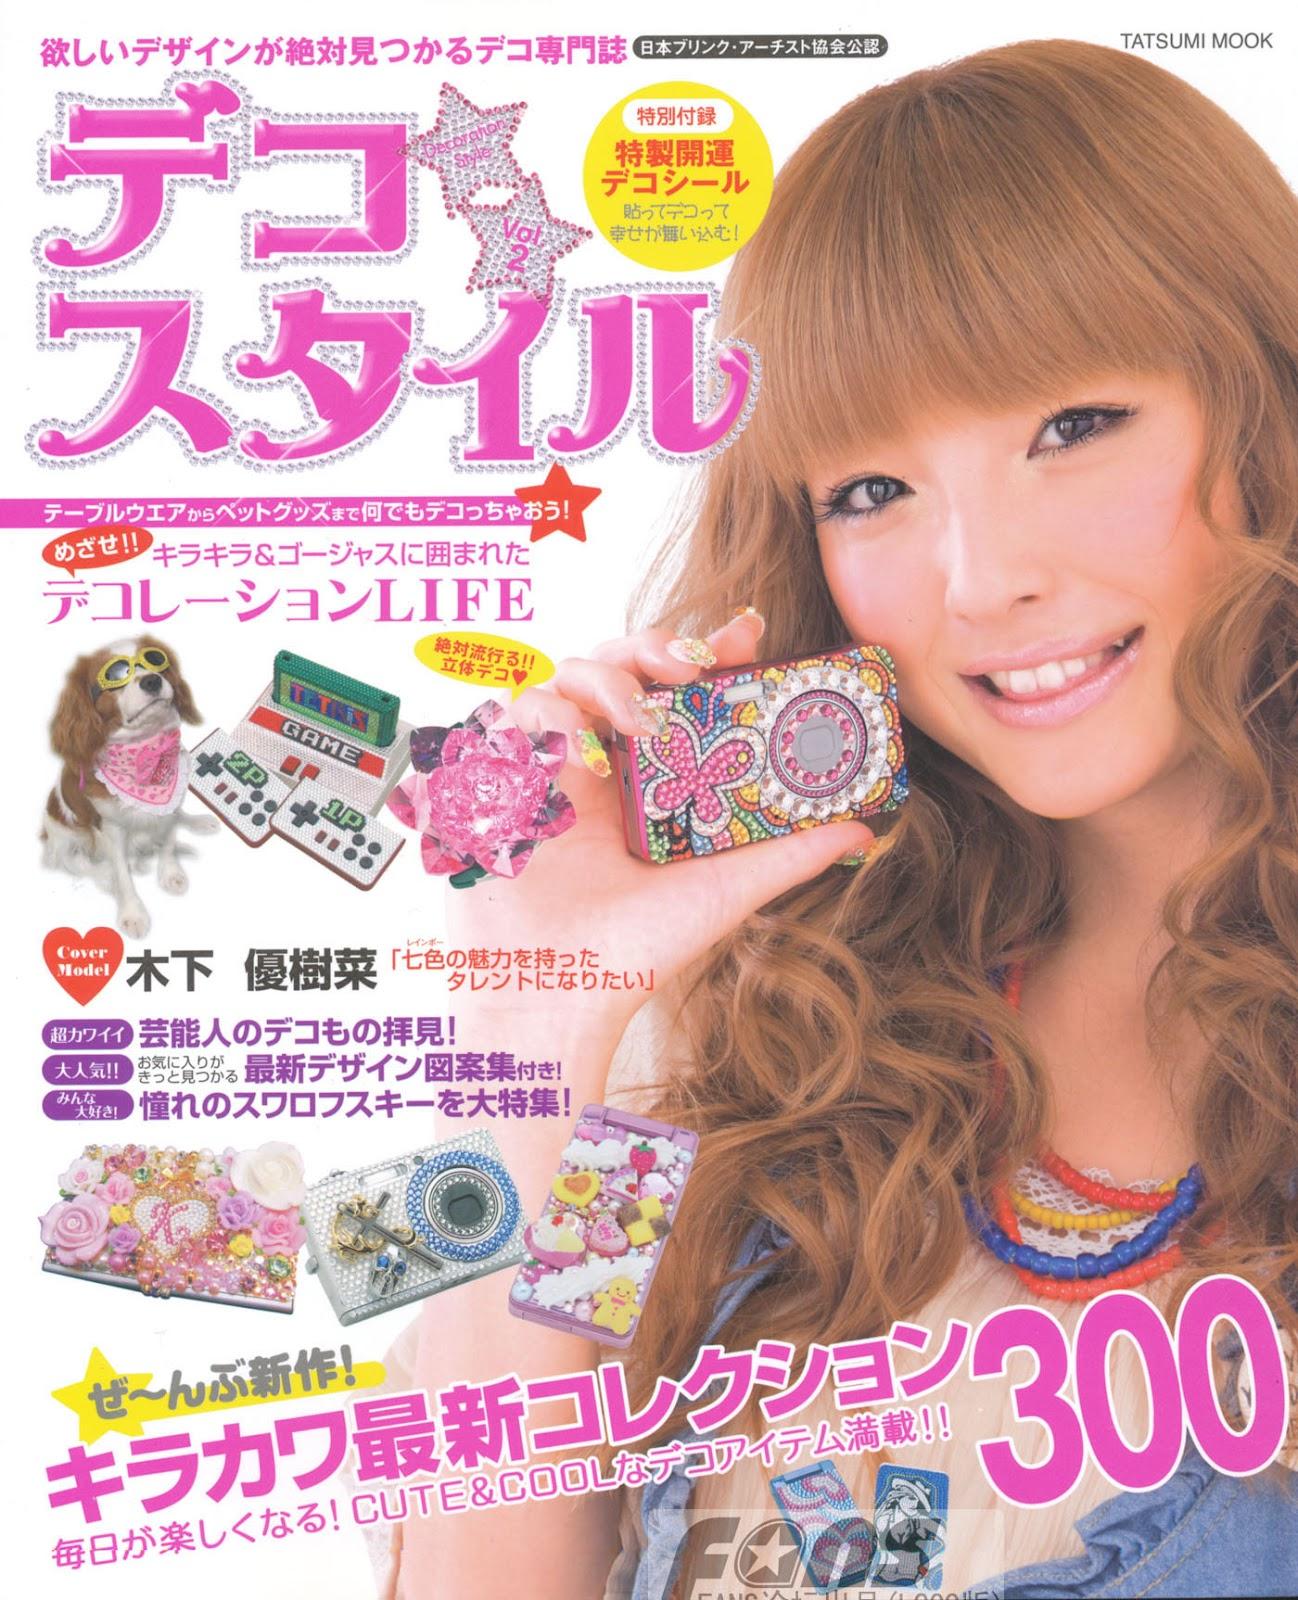 deco style 2008 volume 2 japanese magazine scans